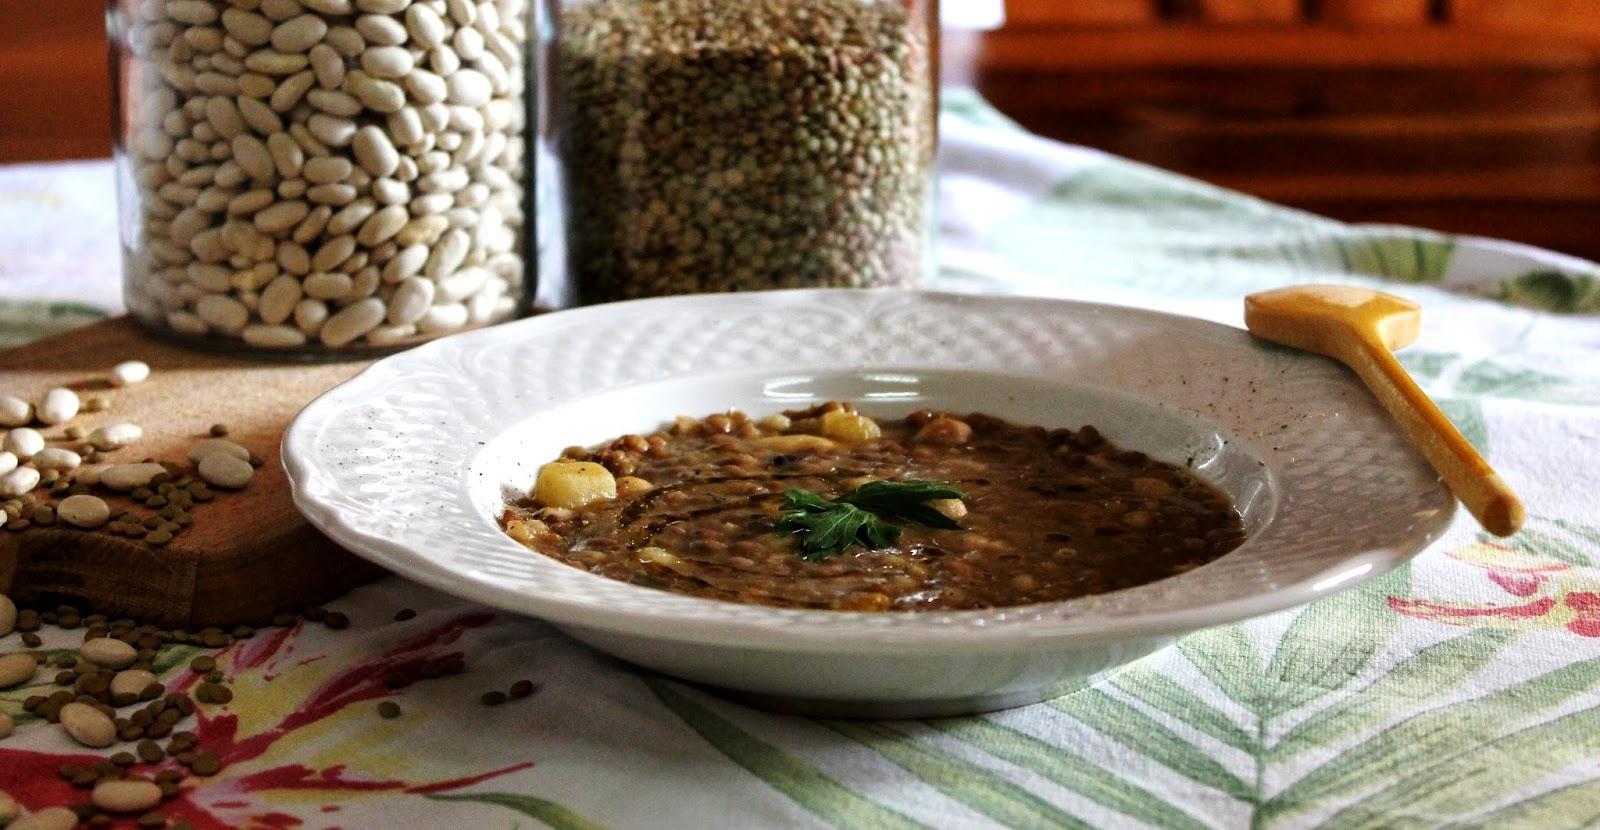 Zuppa rustica di legumi e cereali